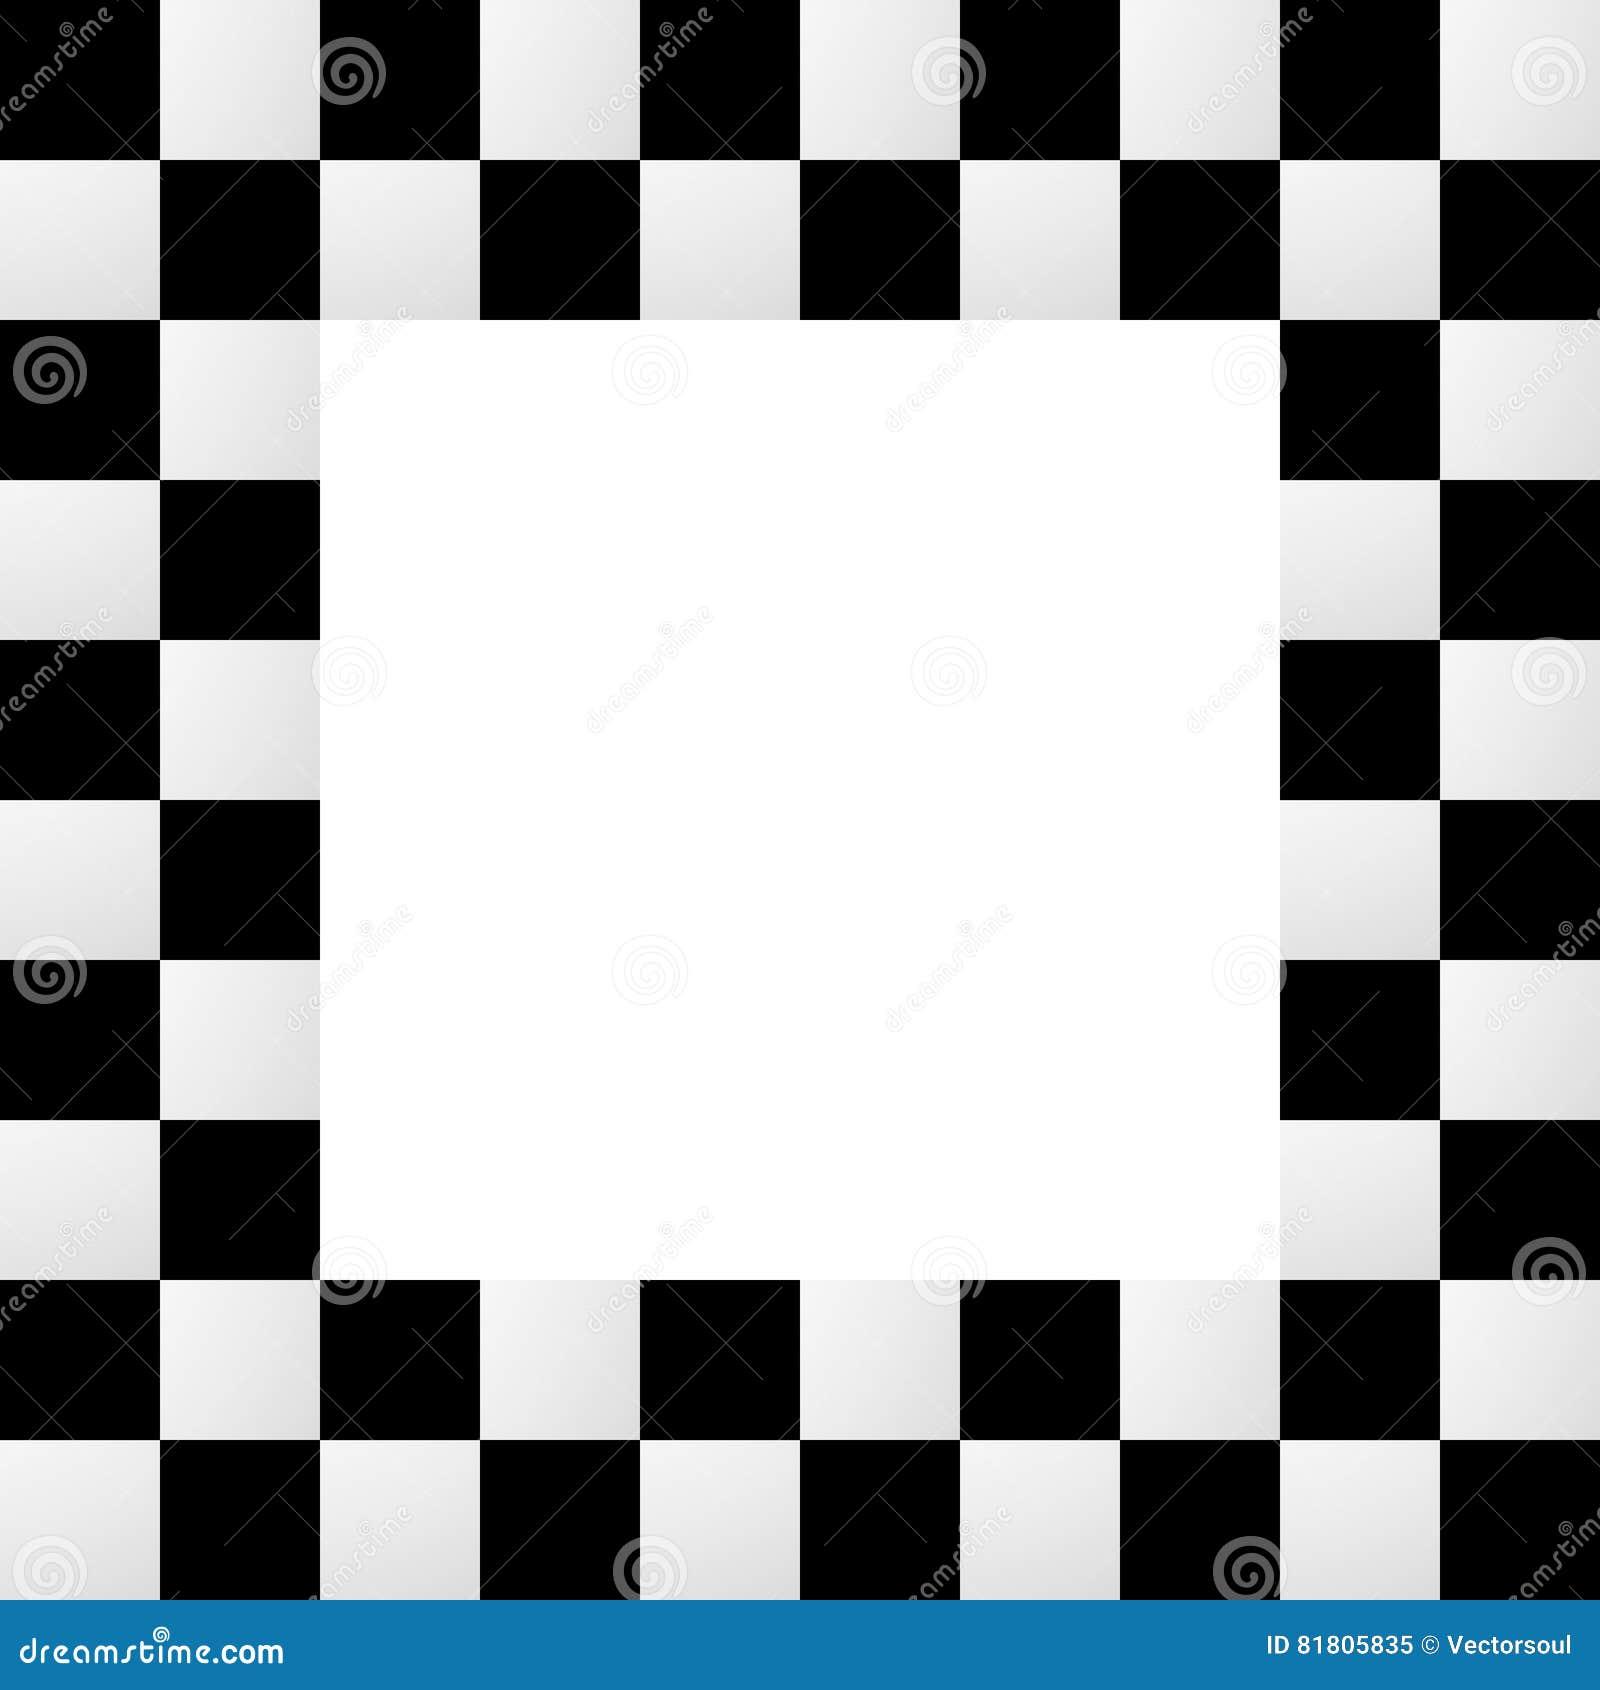 Пустая squarish checkered рамка, граница